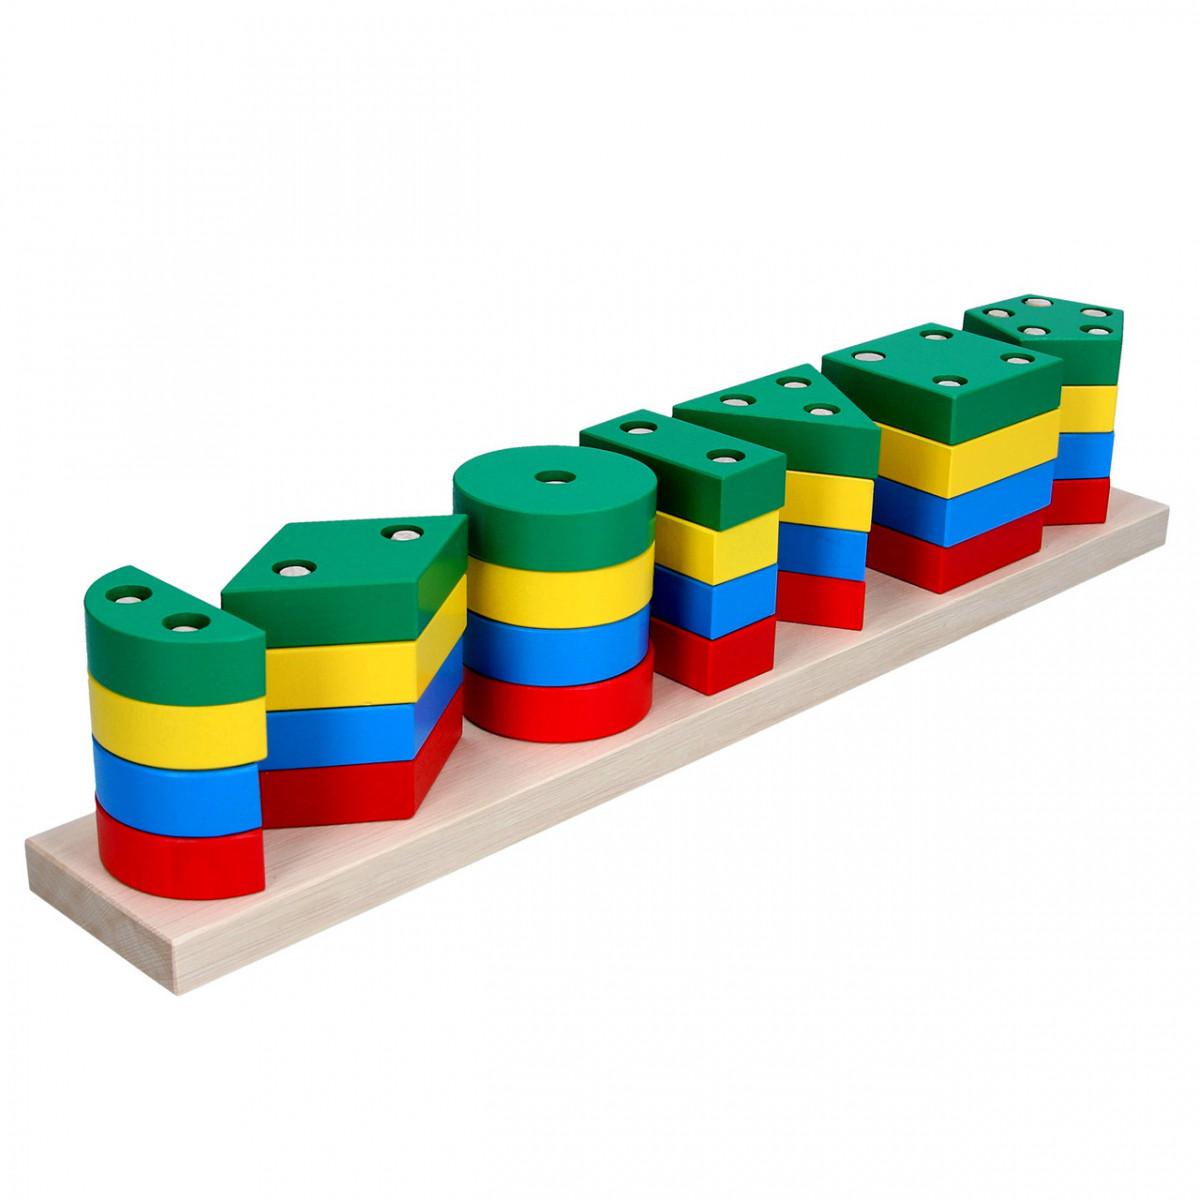 Деревянная пирамидка сортировщик Гео Xxl, Komarovtoys (А 340)